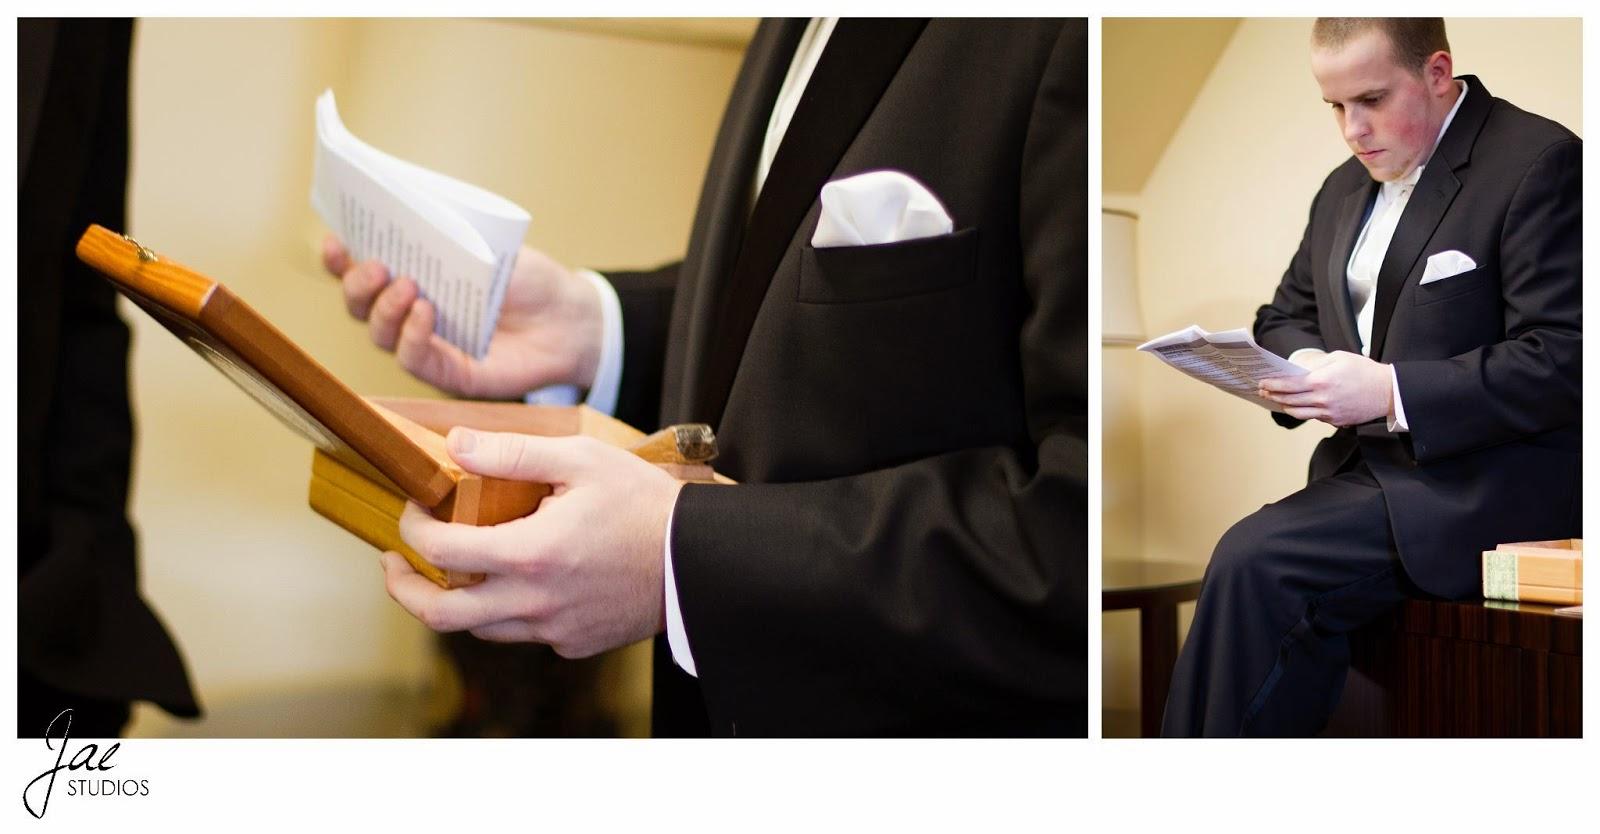 Jonathan and Julie, Bird cage, West Manor Estate, Wedding, Lynchburg, Virginia, Jae Studios, letter, bride, groom, box, tuxedo, reading